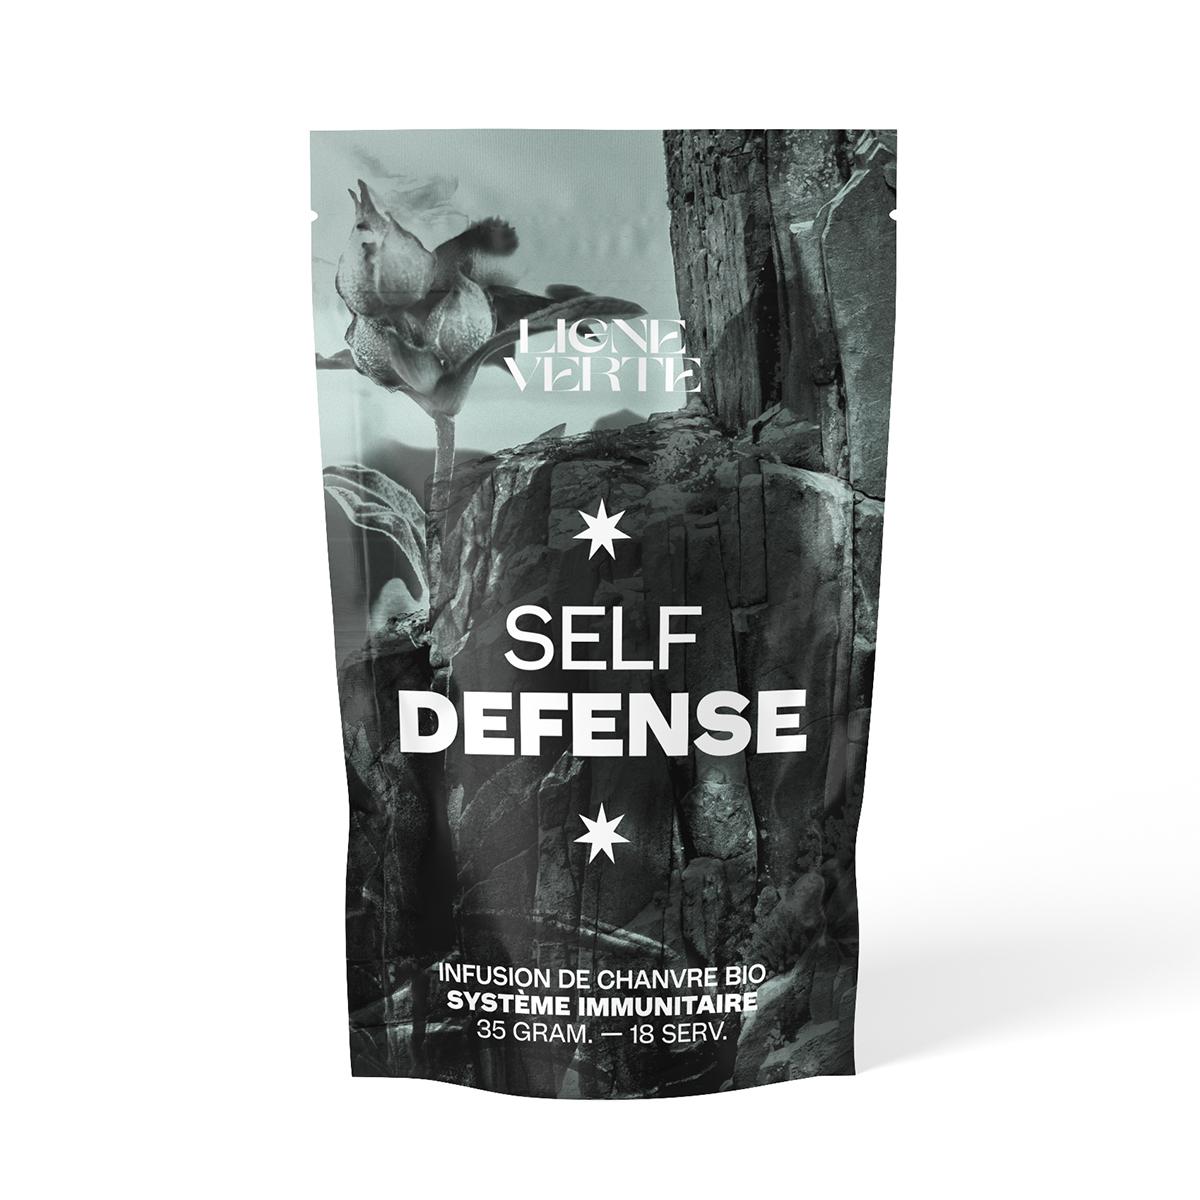 ligne verte infusions ligne verte self defense site px